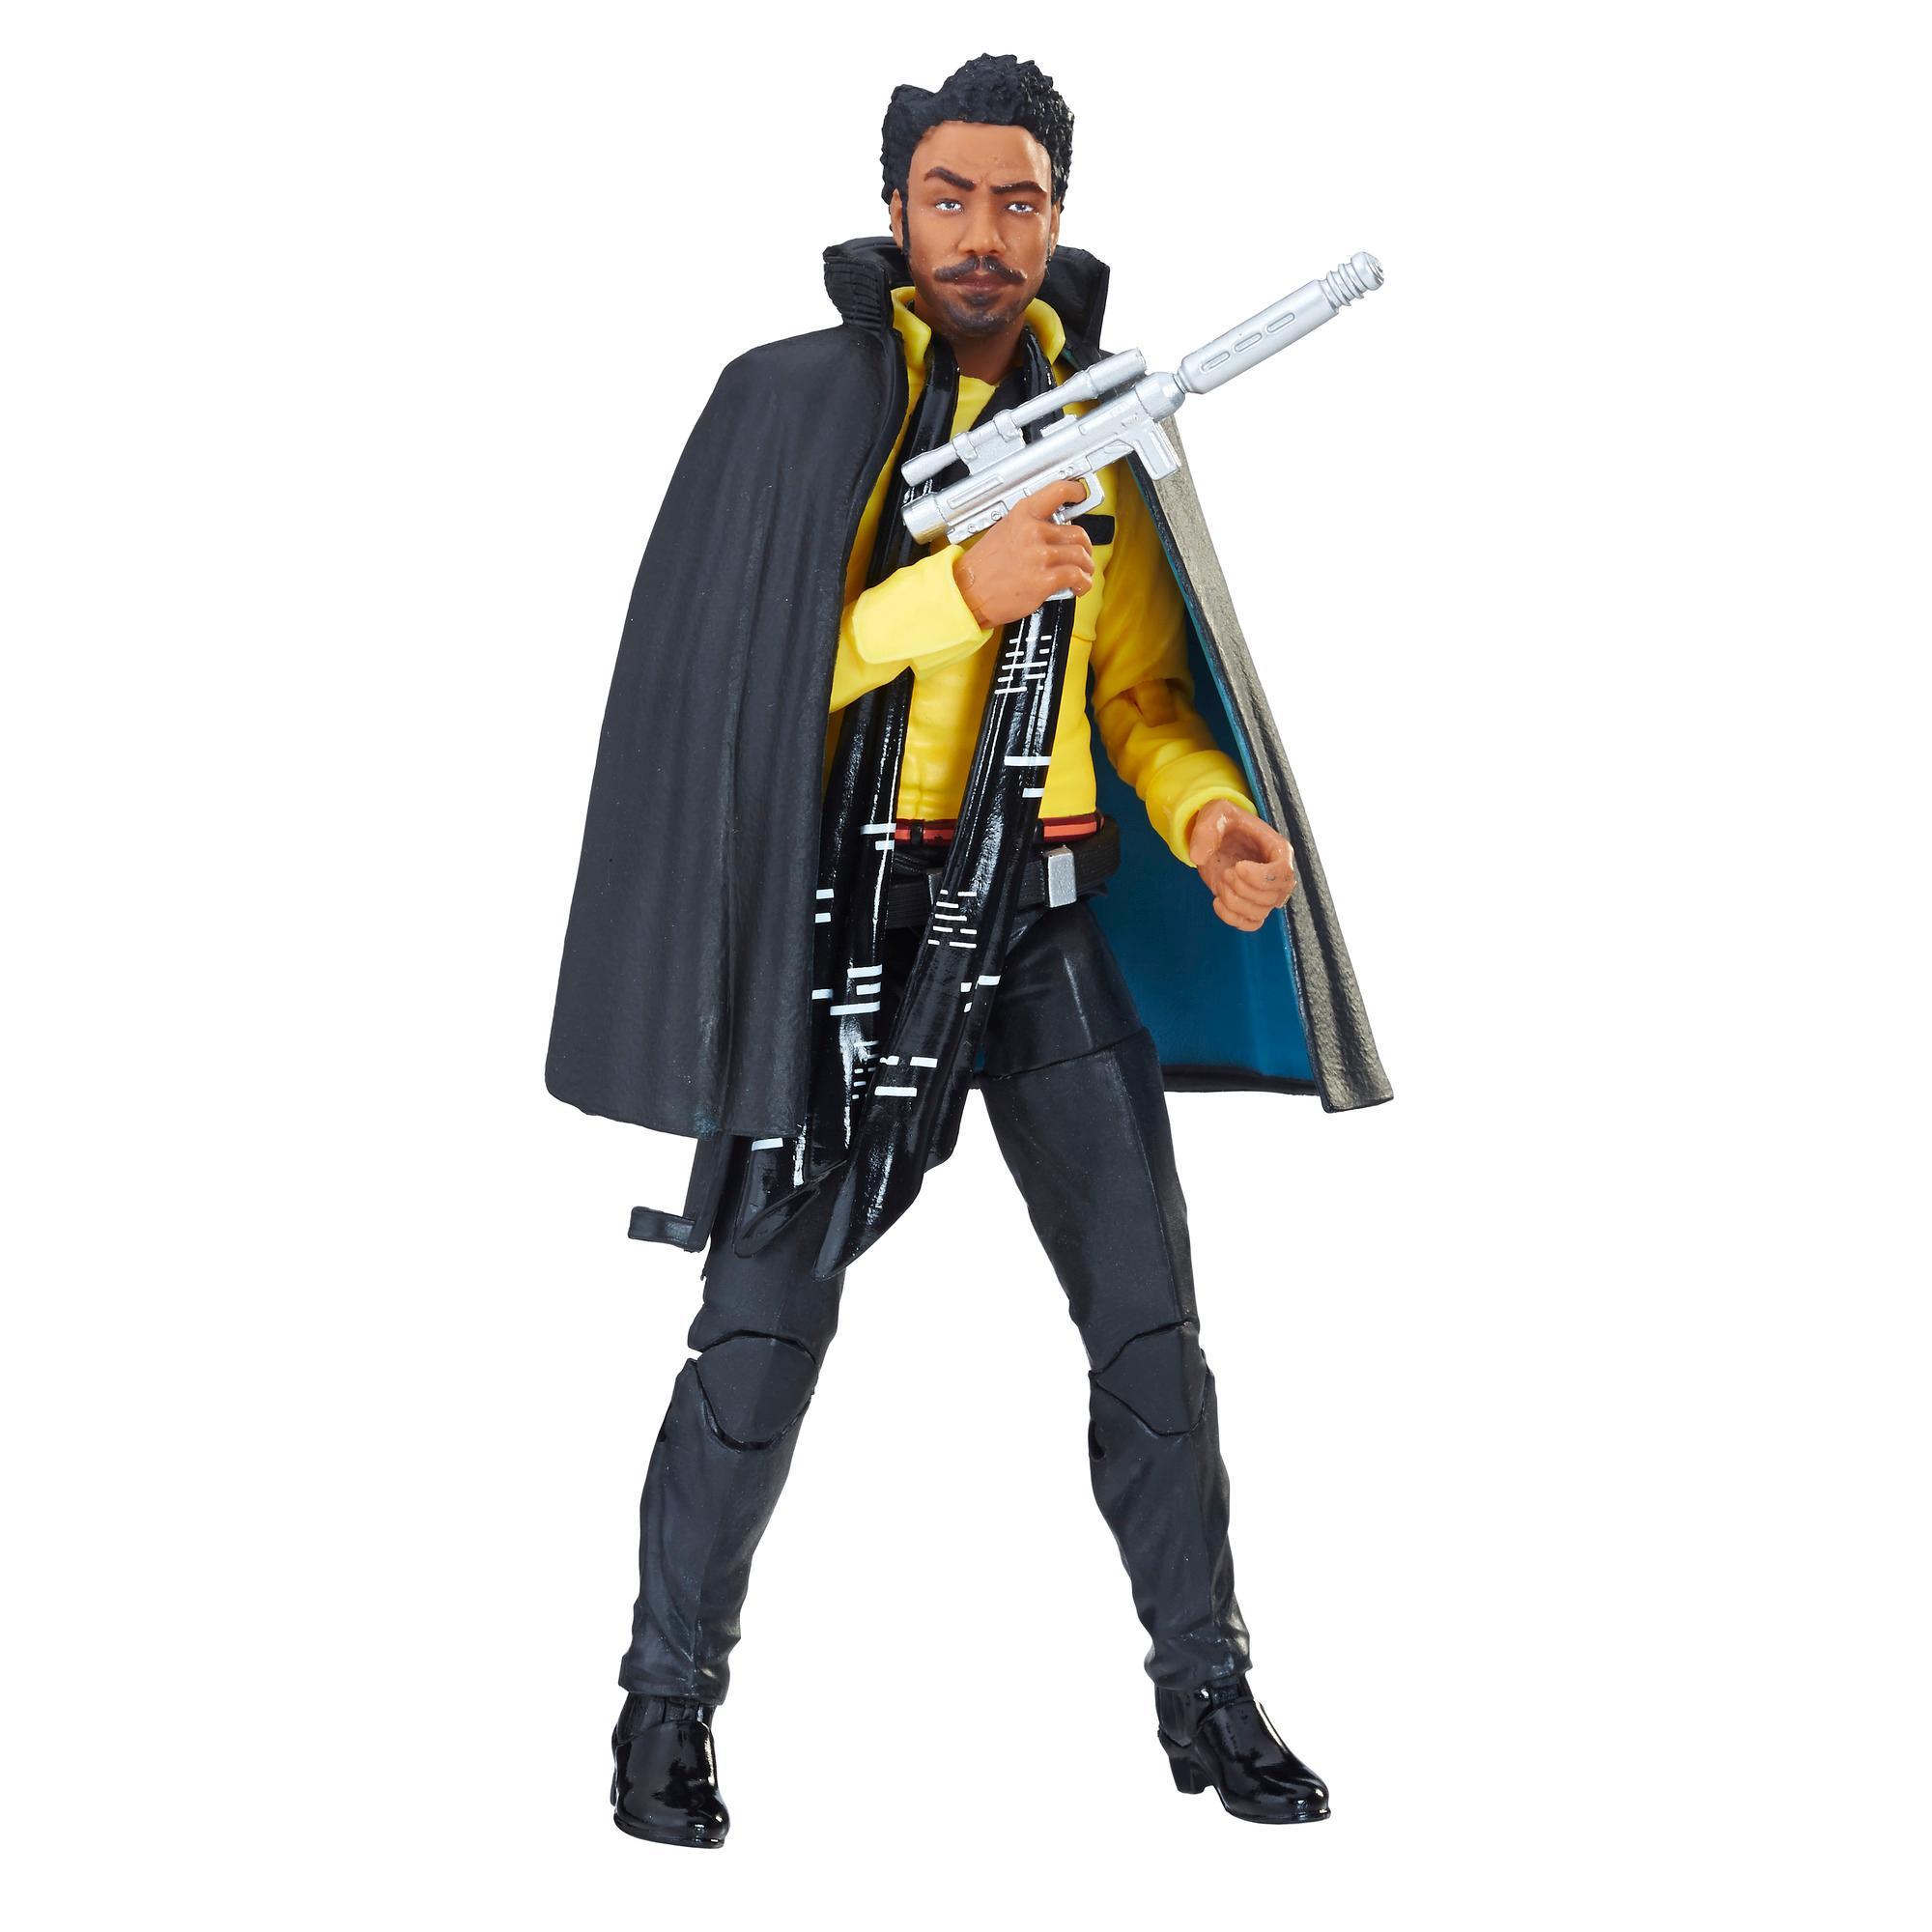 Star Wars Black Series 6 Inch Lando Calrissian Figur